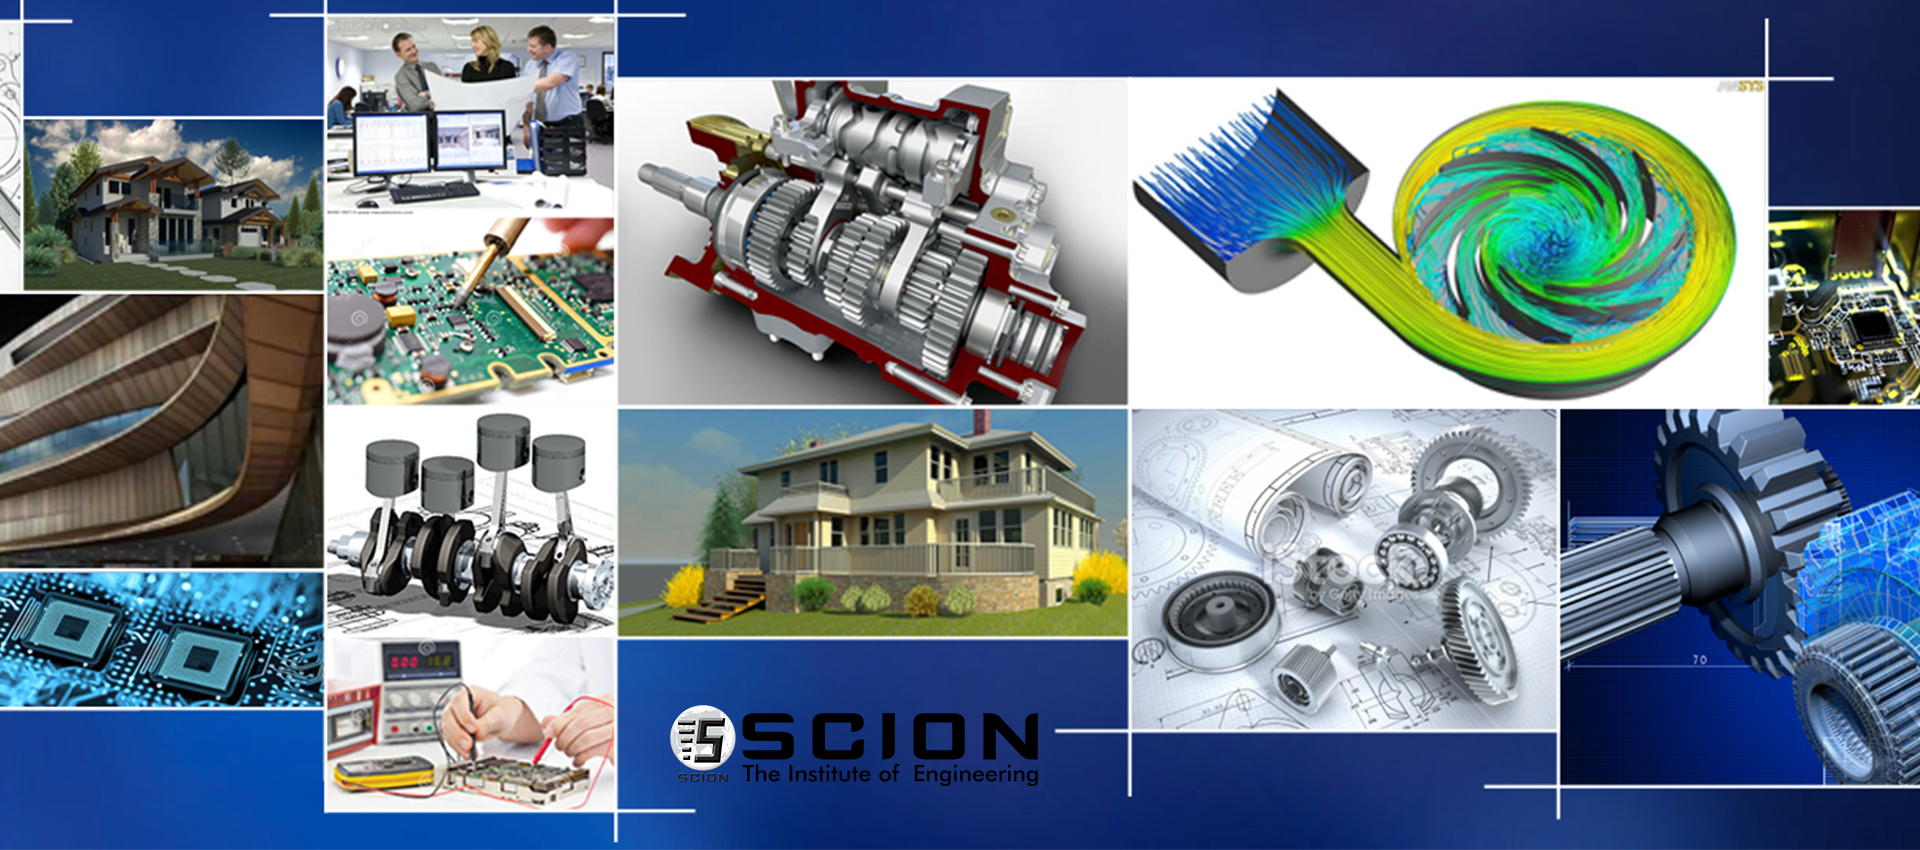 Yesman.lk - Cover Image - SCION Engineering